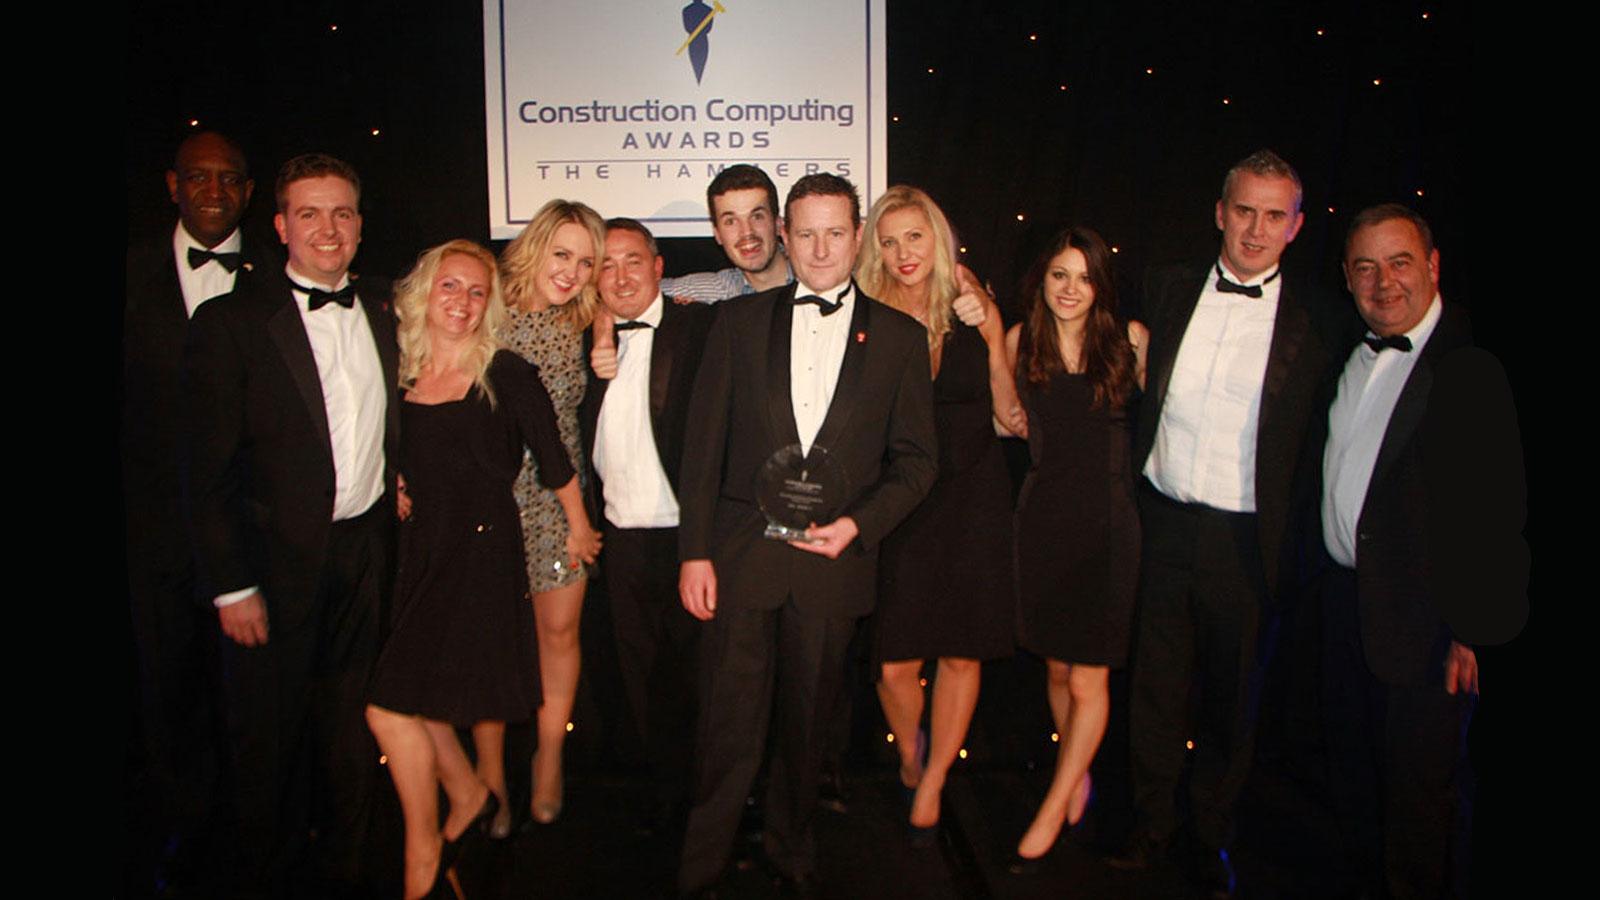 Relive Asite's Computing Construction award success!